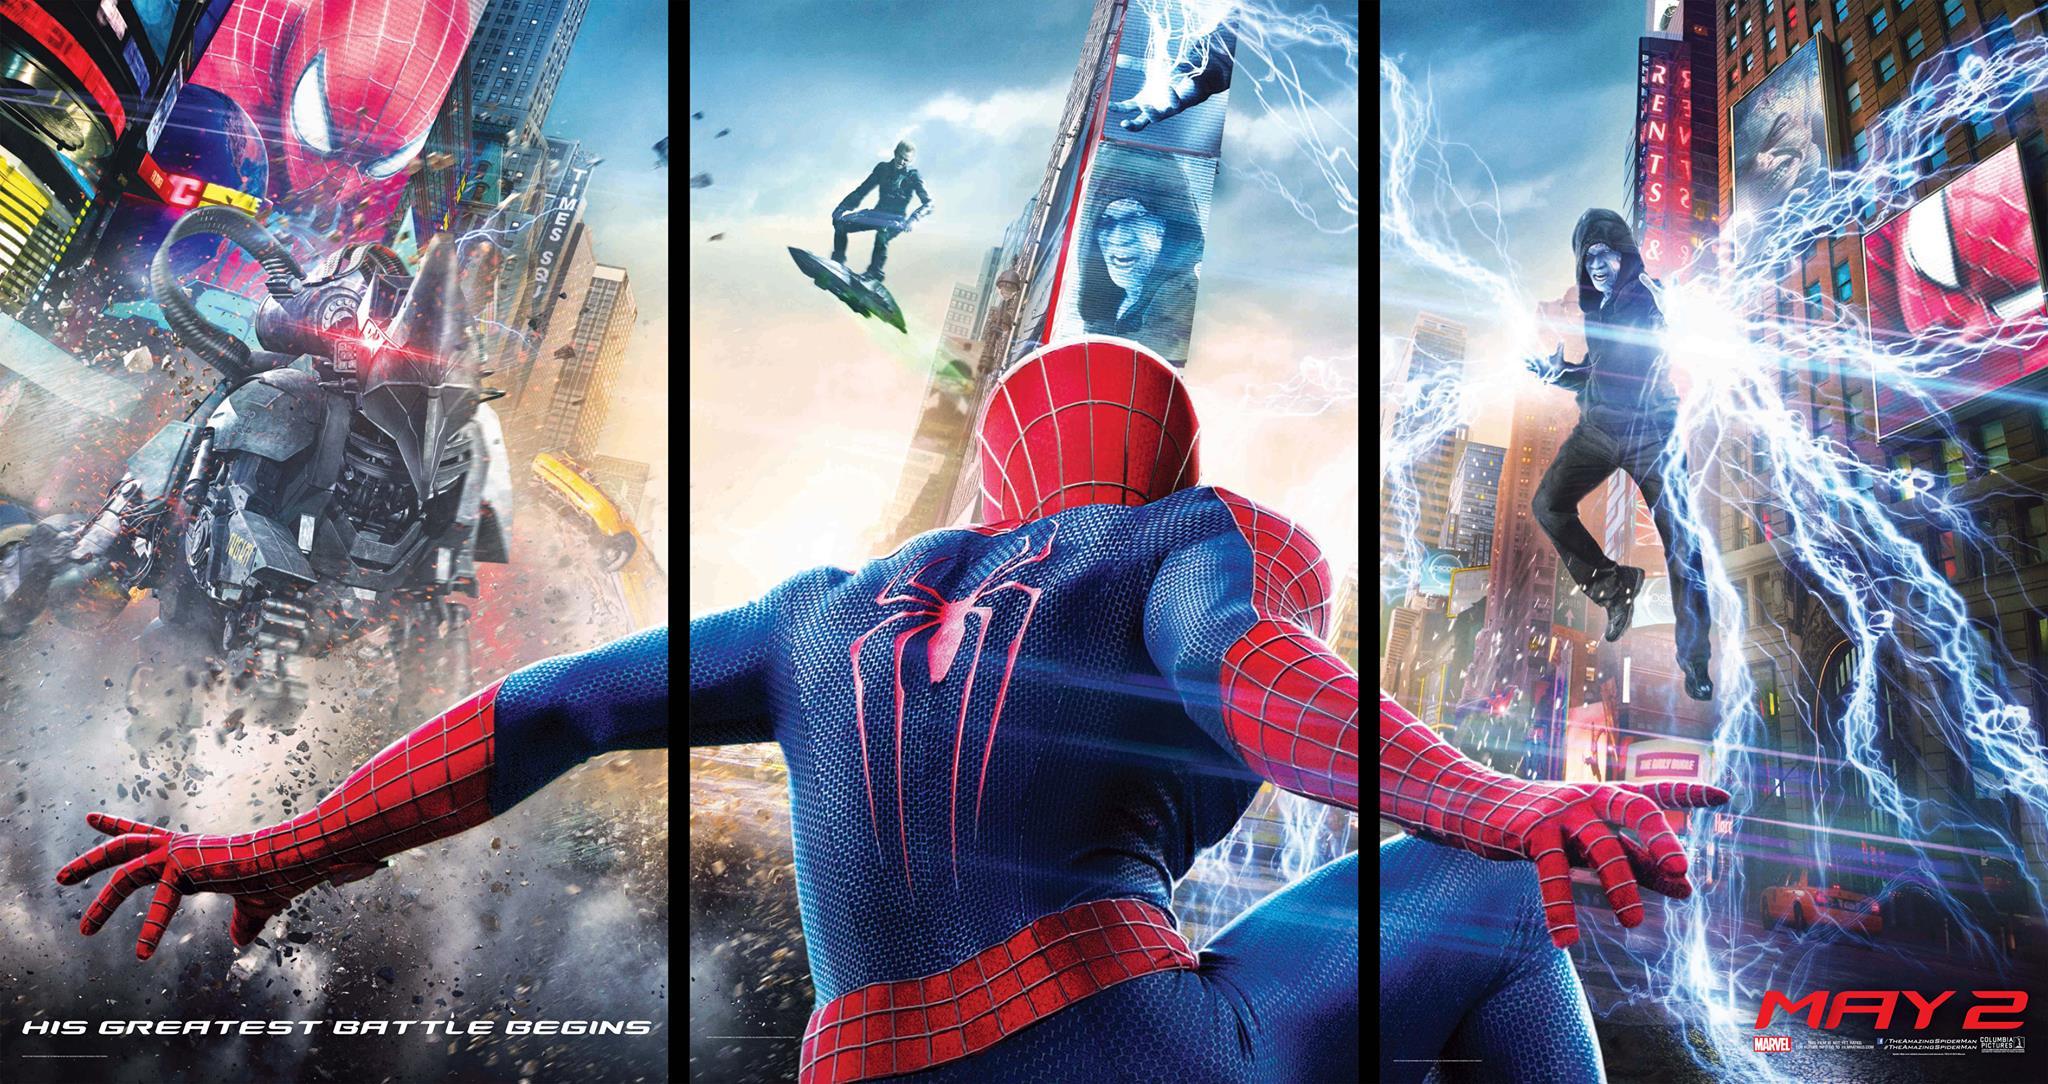 #SpiderMan #Amazing #WallPaper #May  Постеры The Amazing Spider-Man 2. Электро тут напоминает смесь Алекса Мерсера и .... - Изображение 1